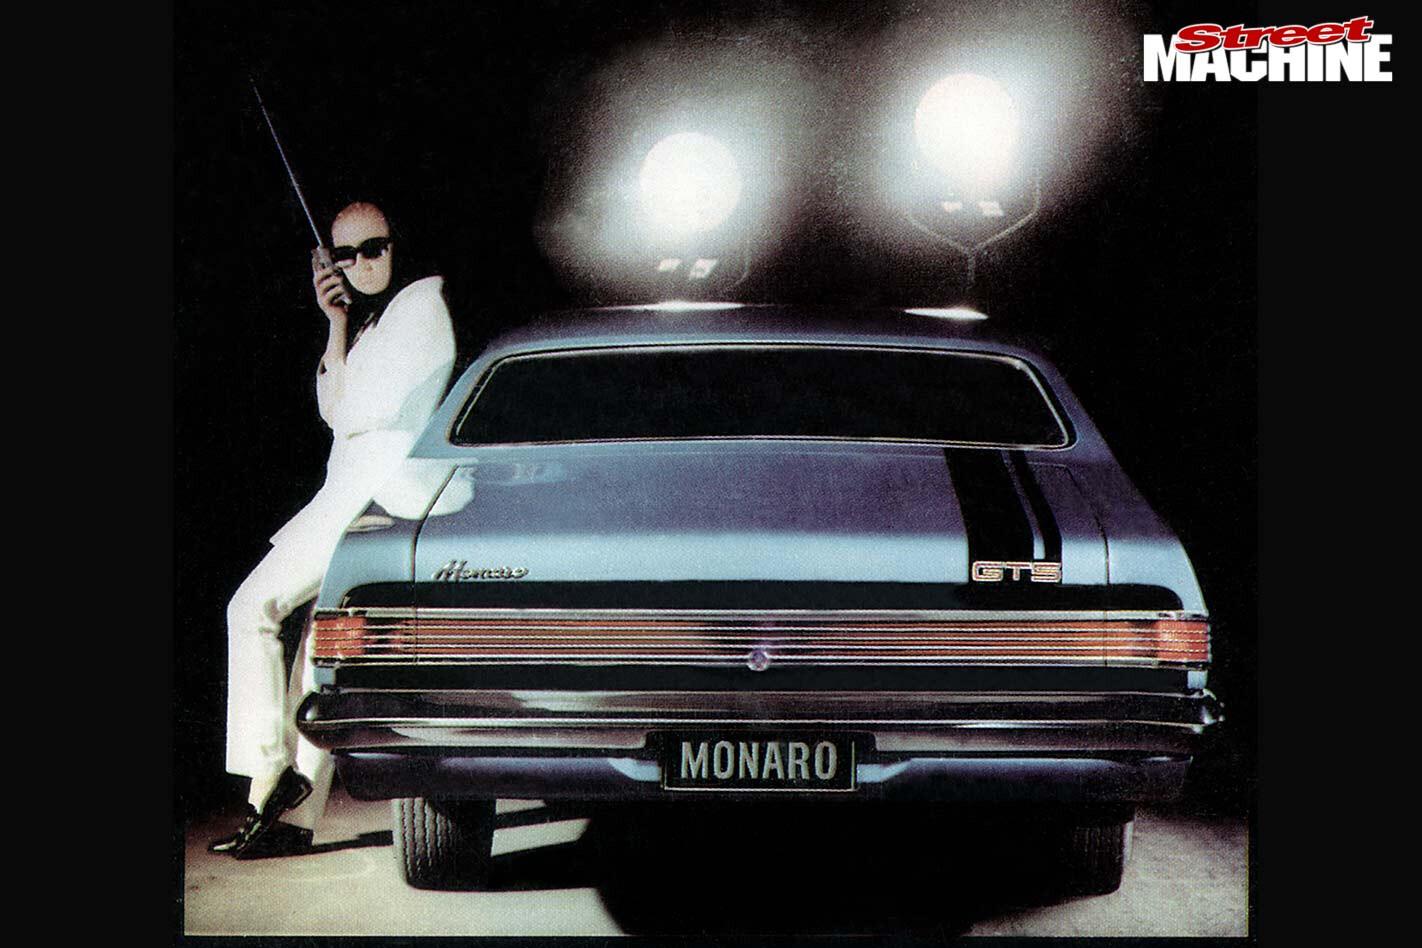 Holden HK Monaro GTS